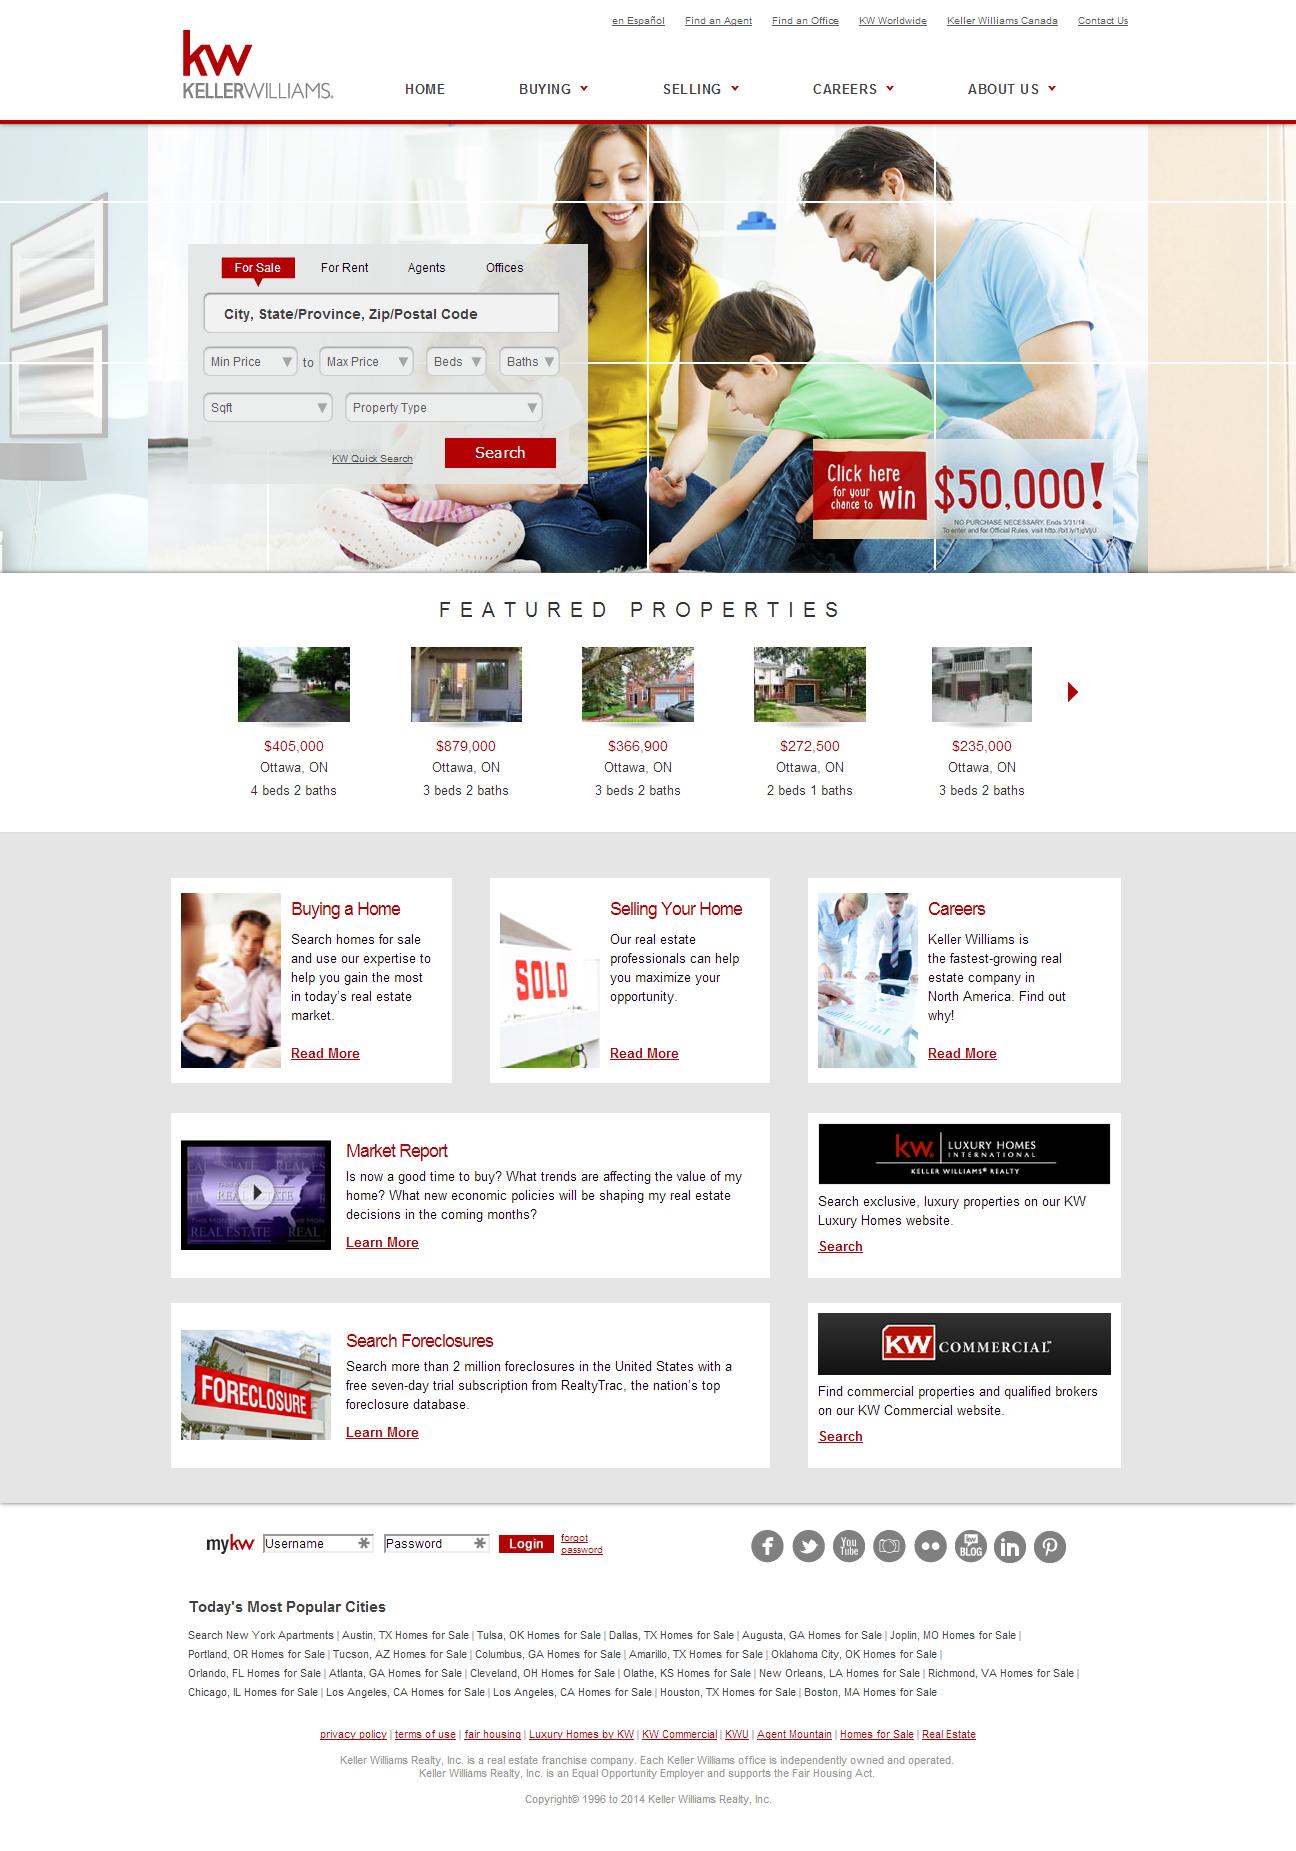 Keller Williams Keller Williams Web Design Real Estate Companies